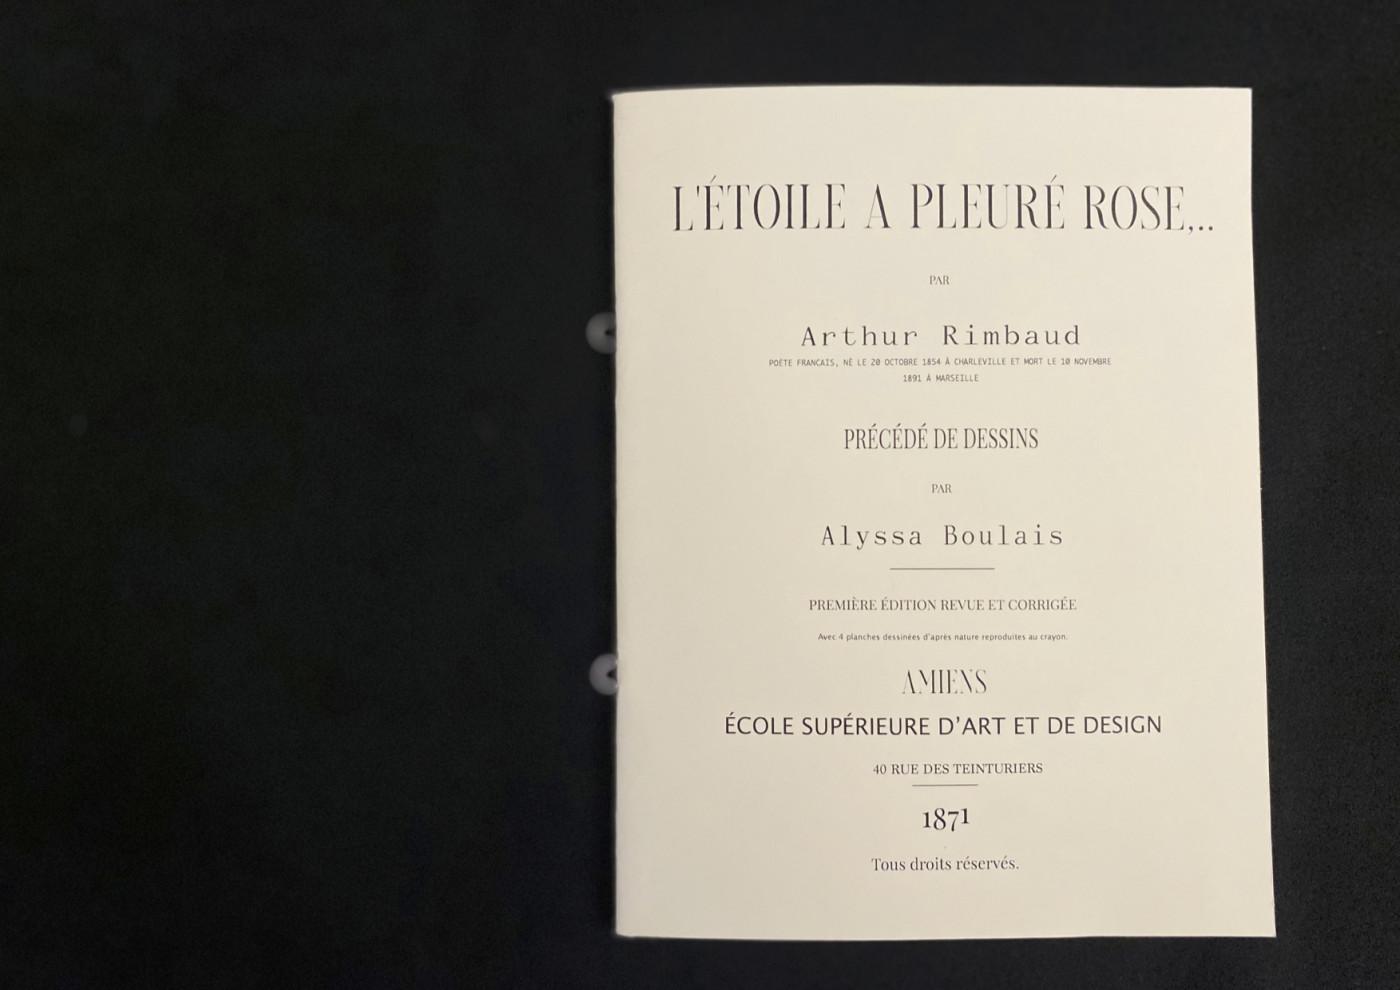 Rapport Texte/Image